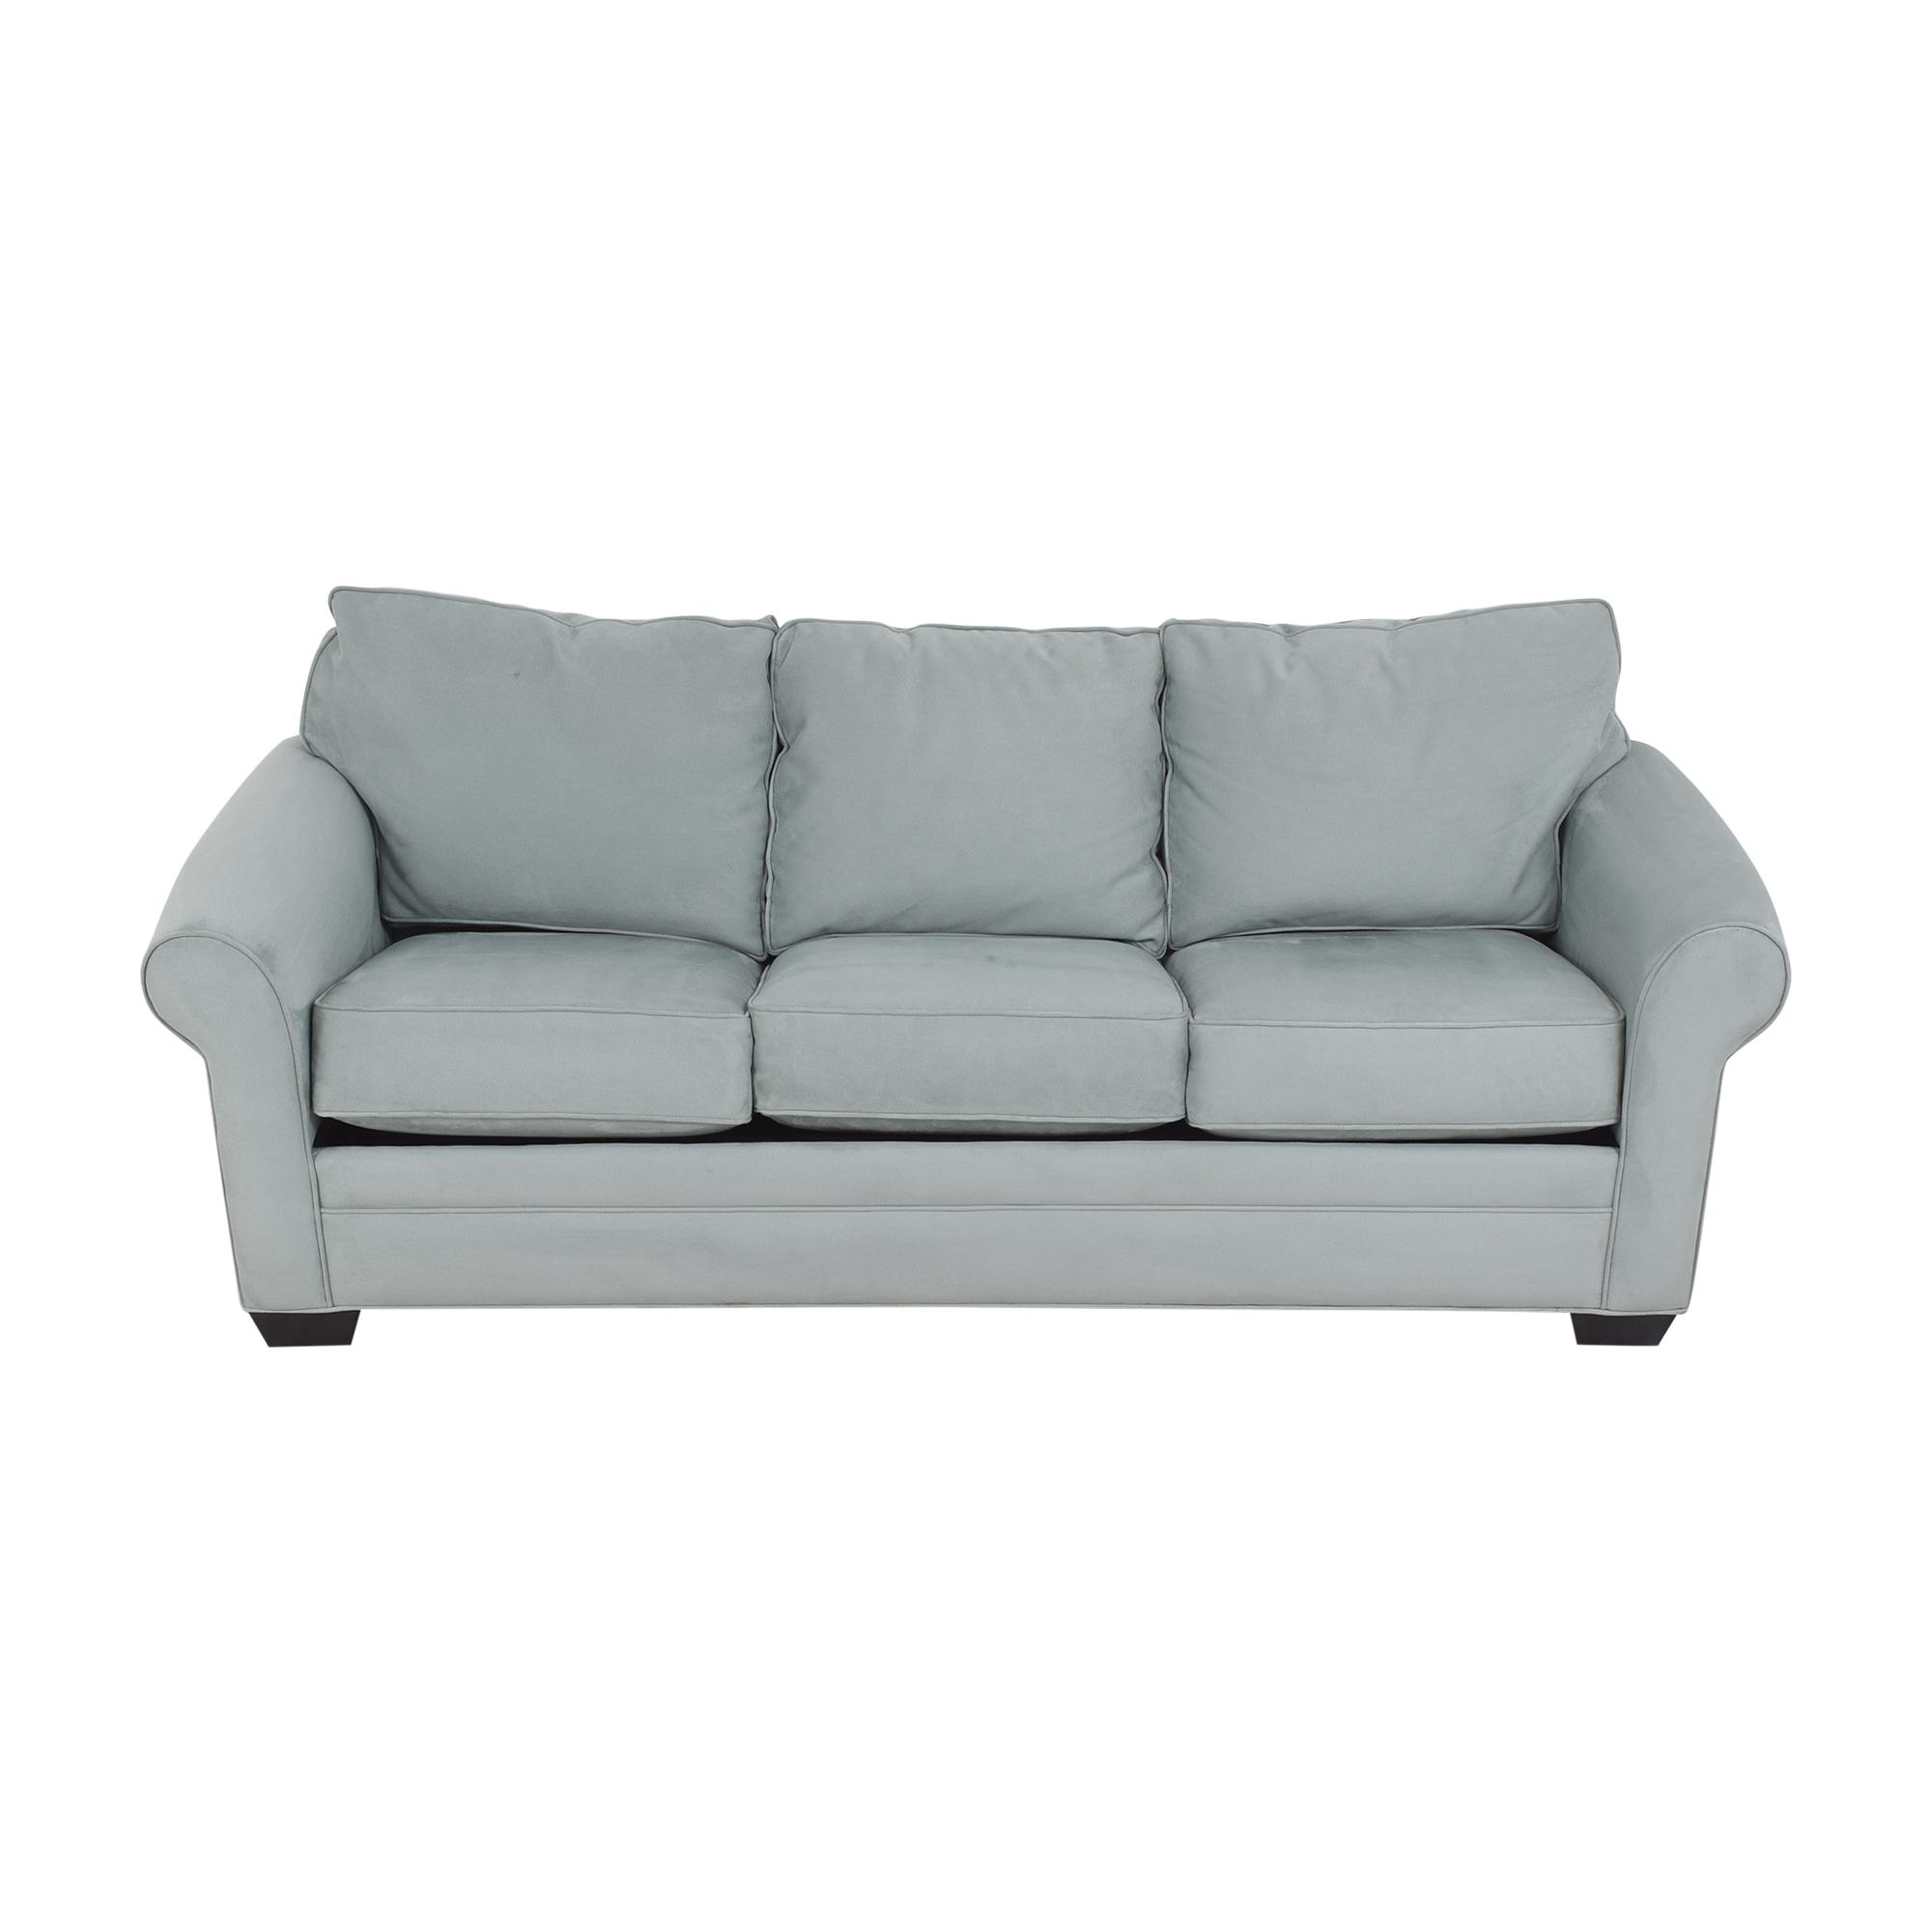 Cindy Crawford Home Cindy Crawford Home Bellingham Hydra Sleeper Sofa on sale